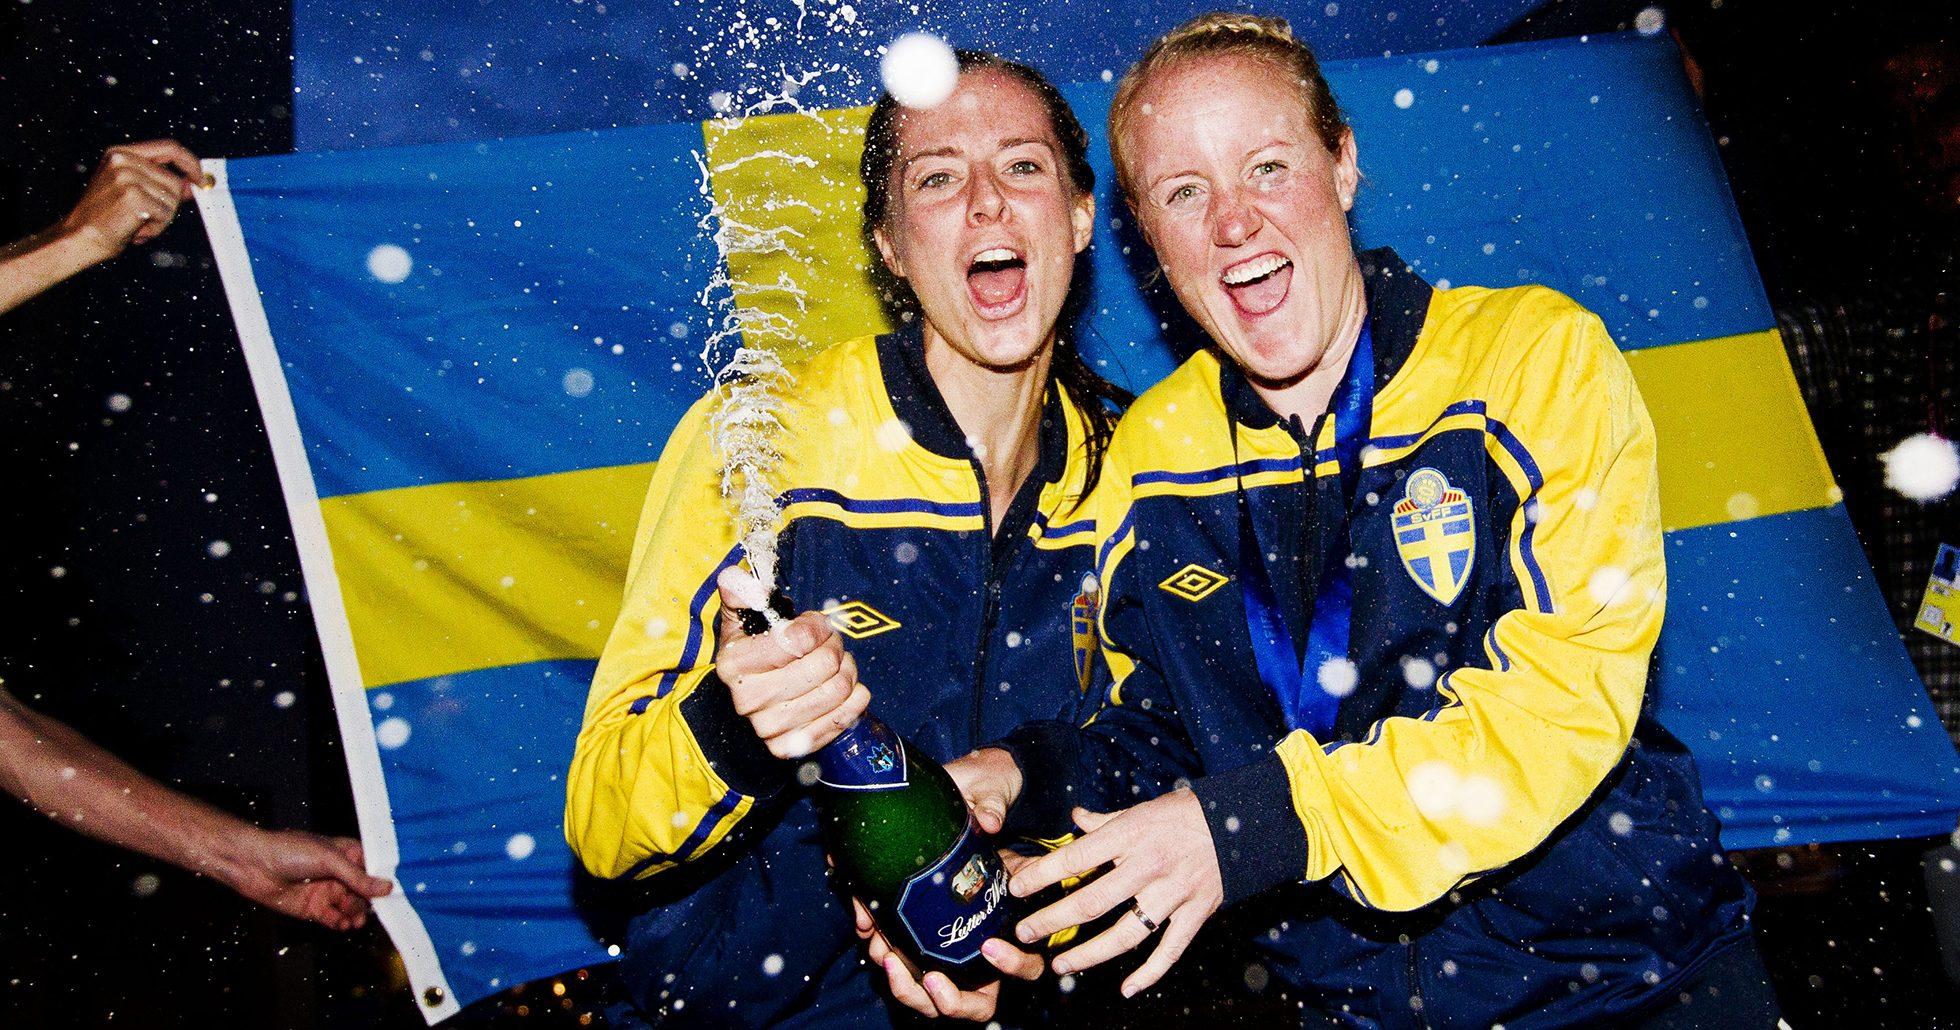 Fotbolls landslaget firar efter bronset 2011